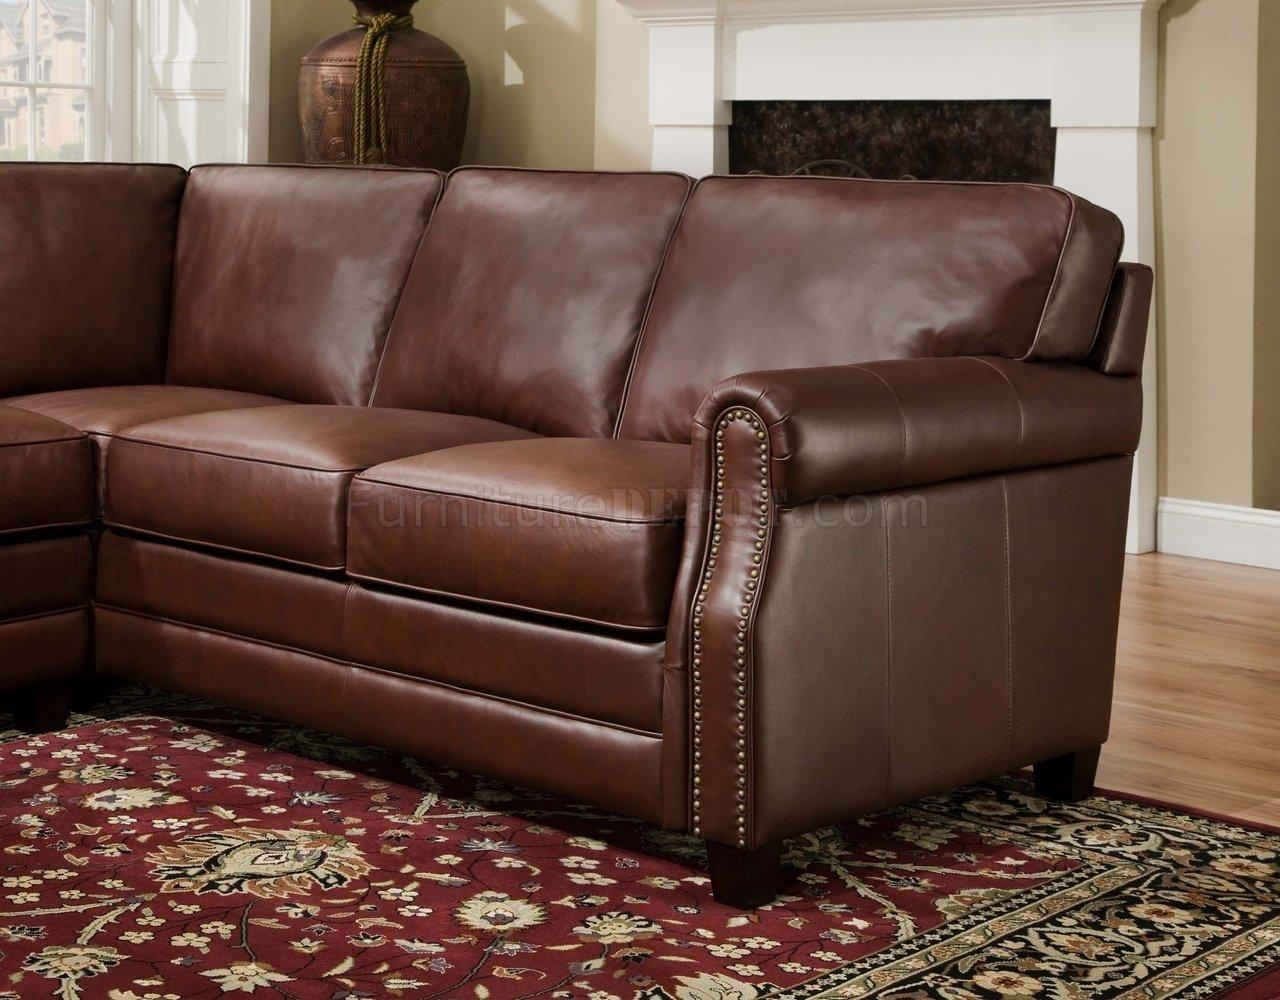 Sofas Center : Traditional Sectional Sofas Luxury Sleeper With Traditional Sectional Sofas (Image 14 of 20)